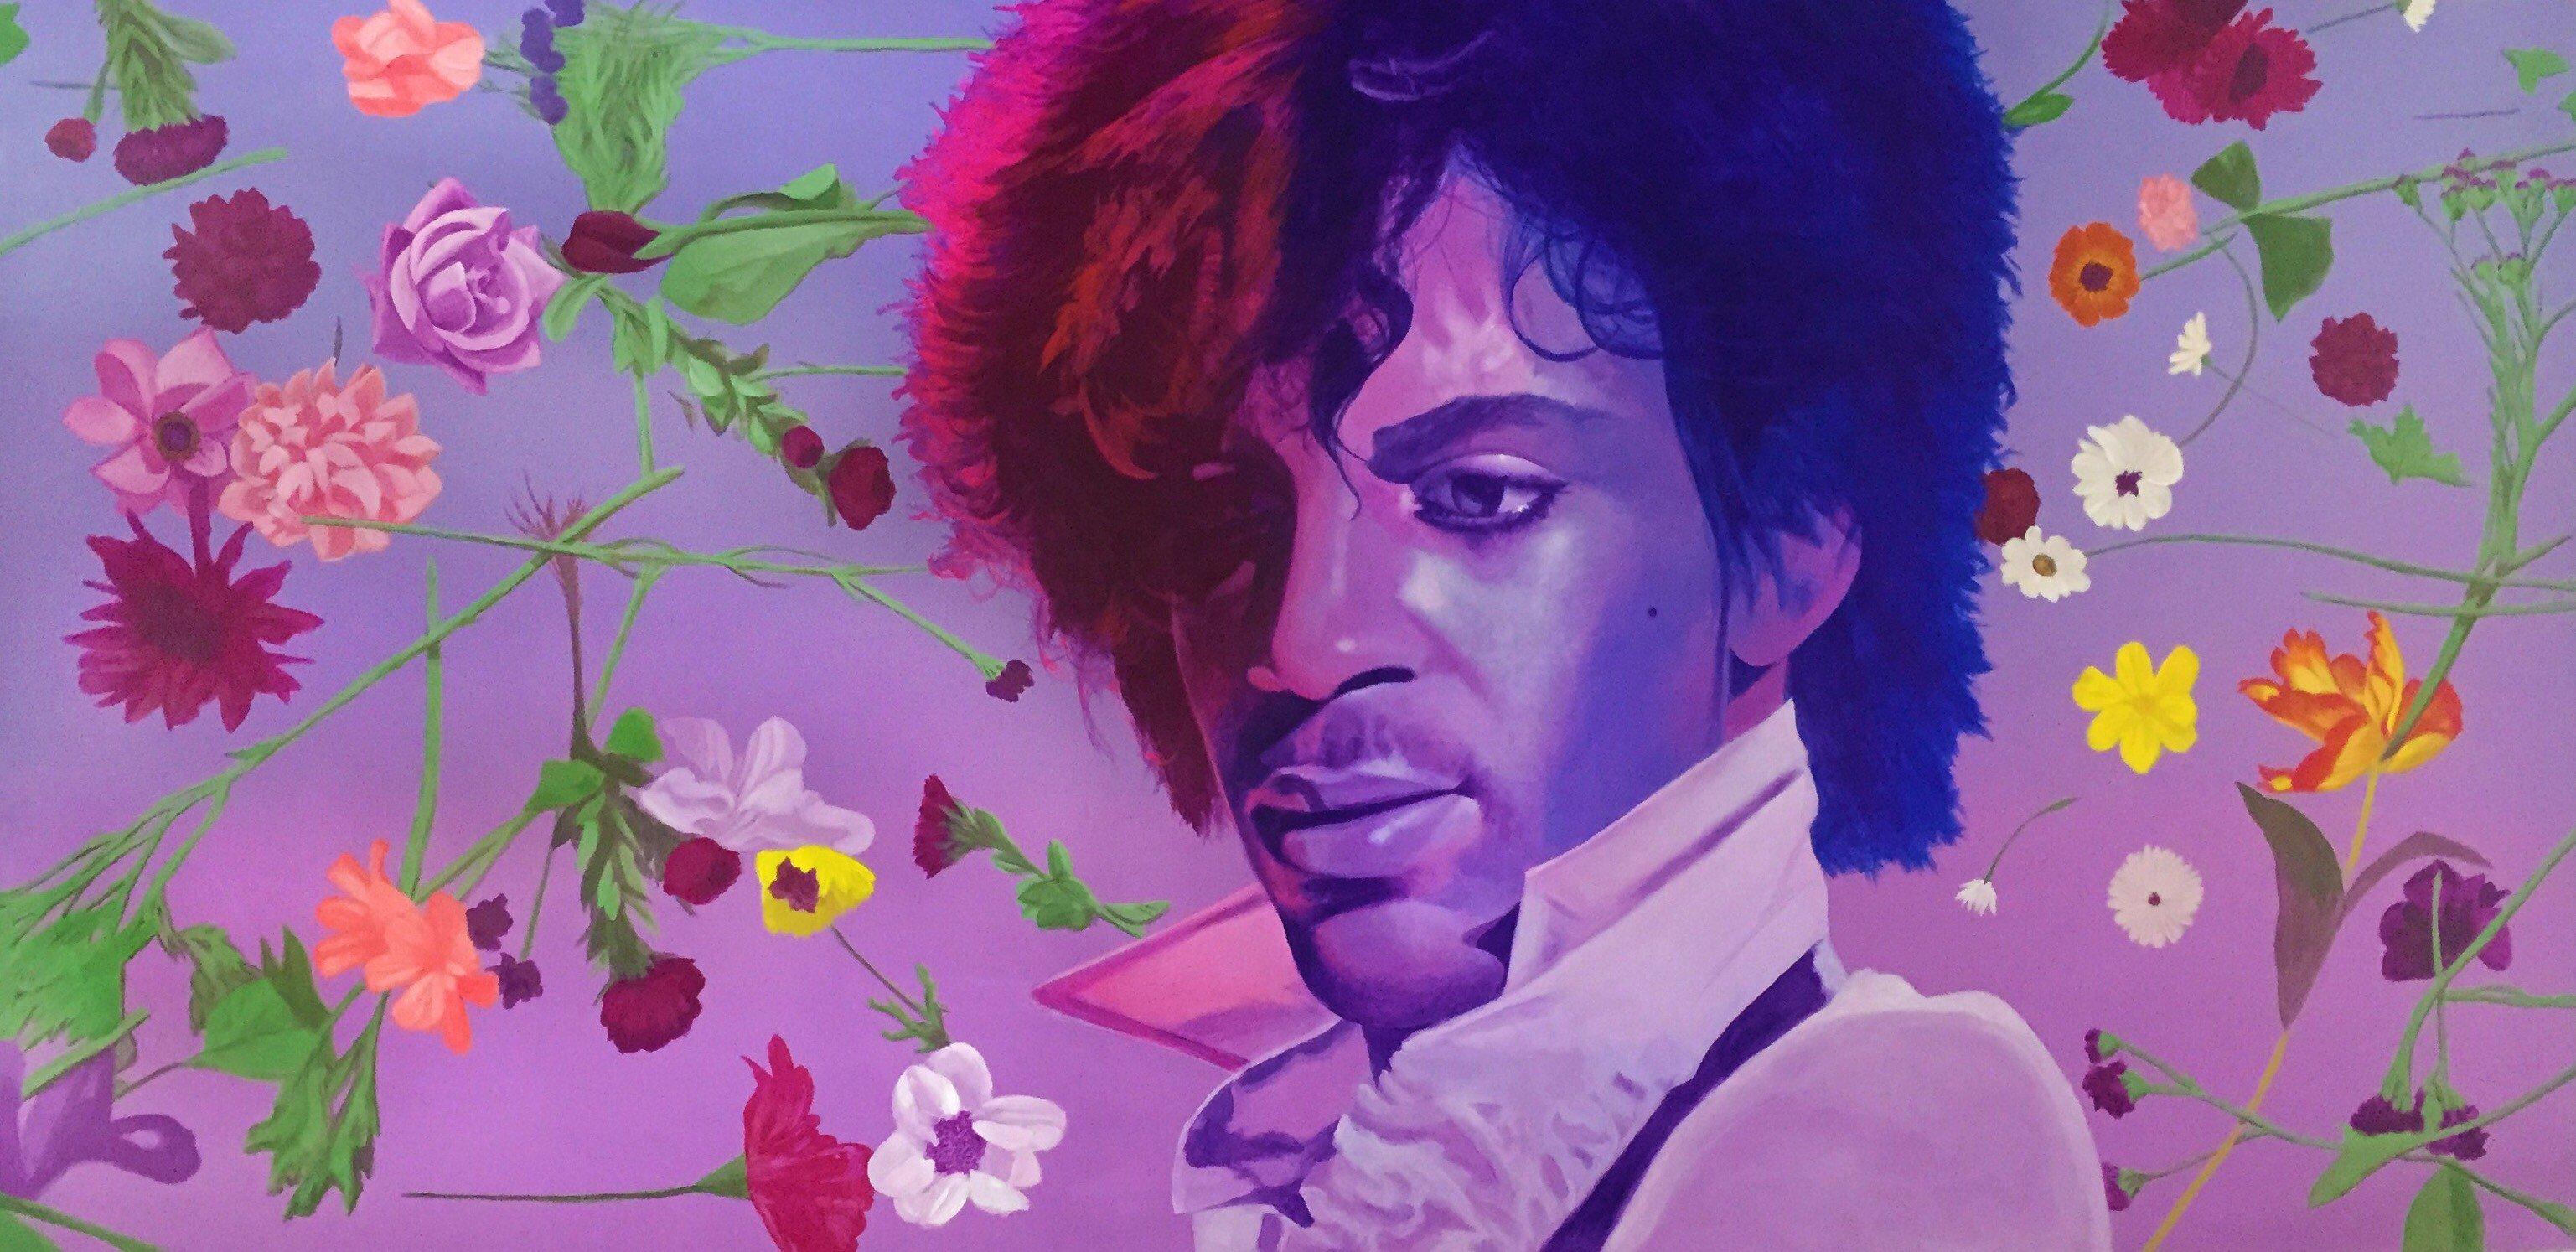 Prince Mural - Cundiff.jpg